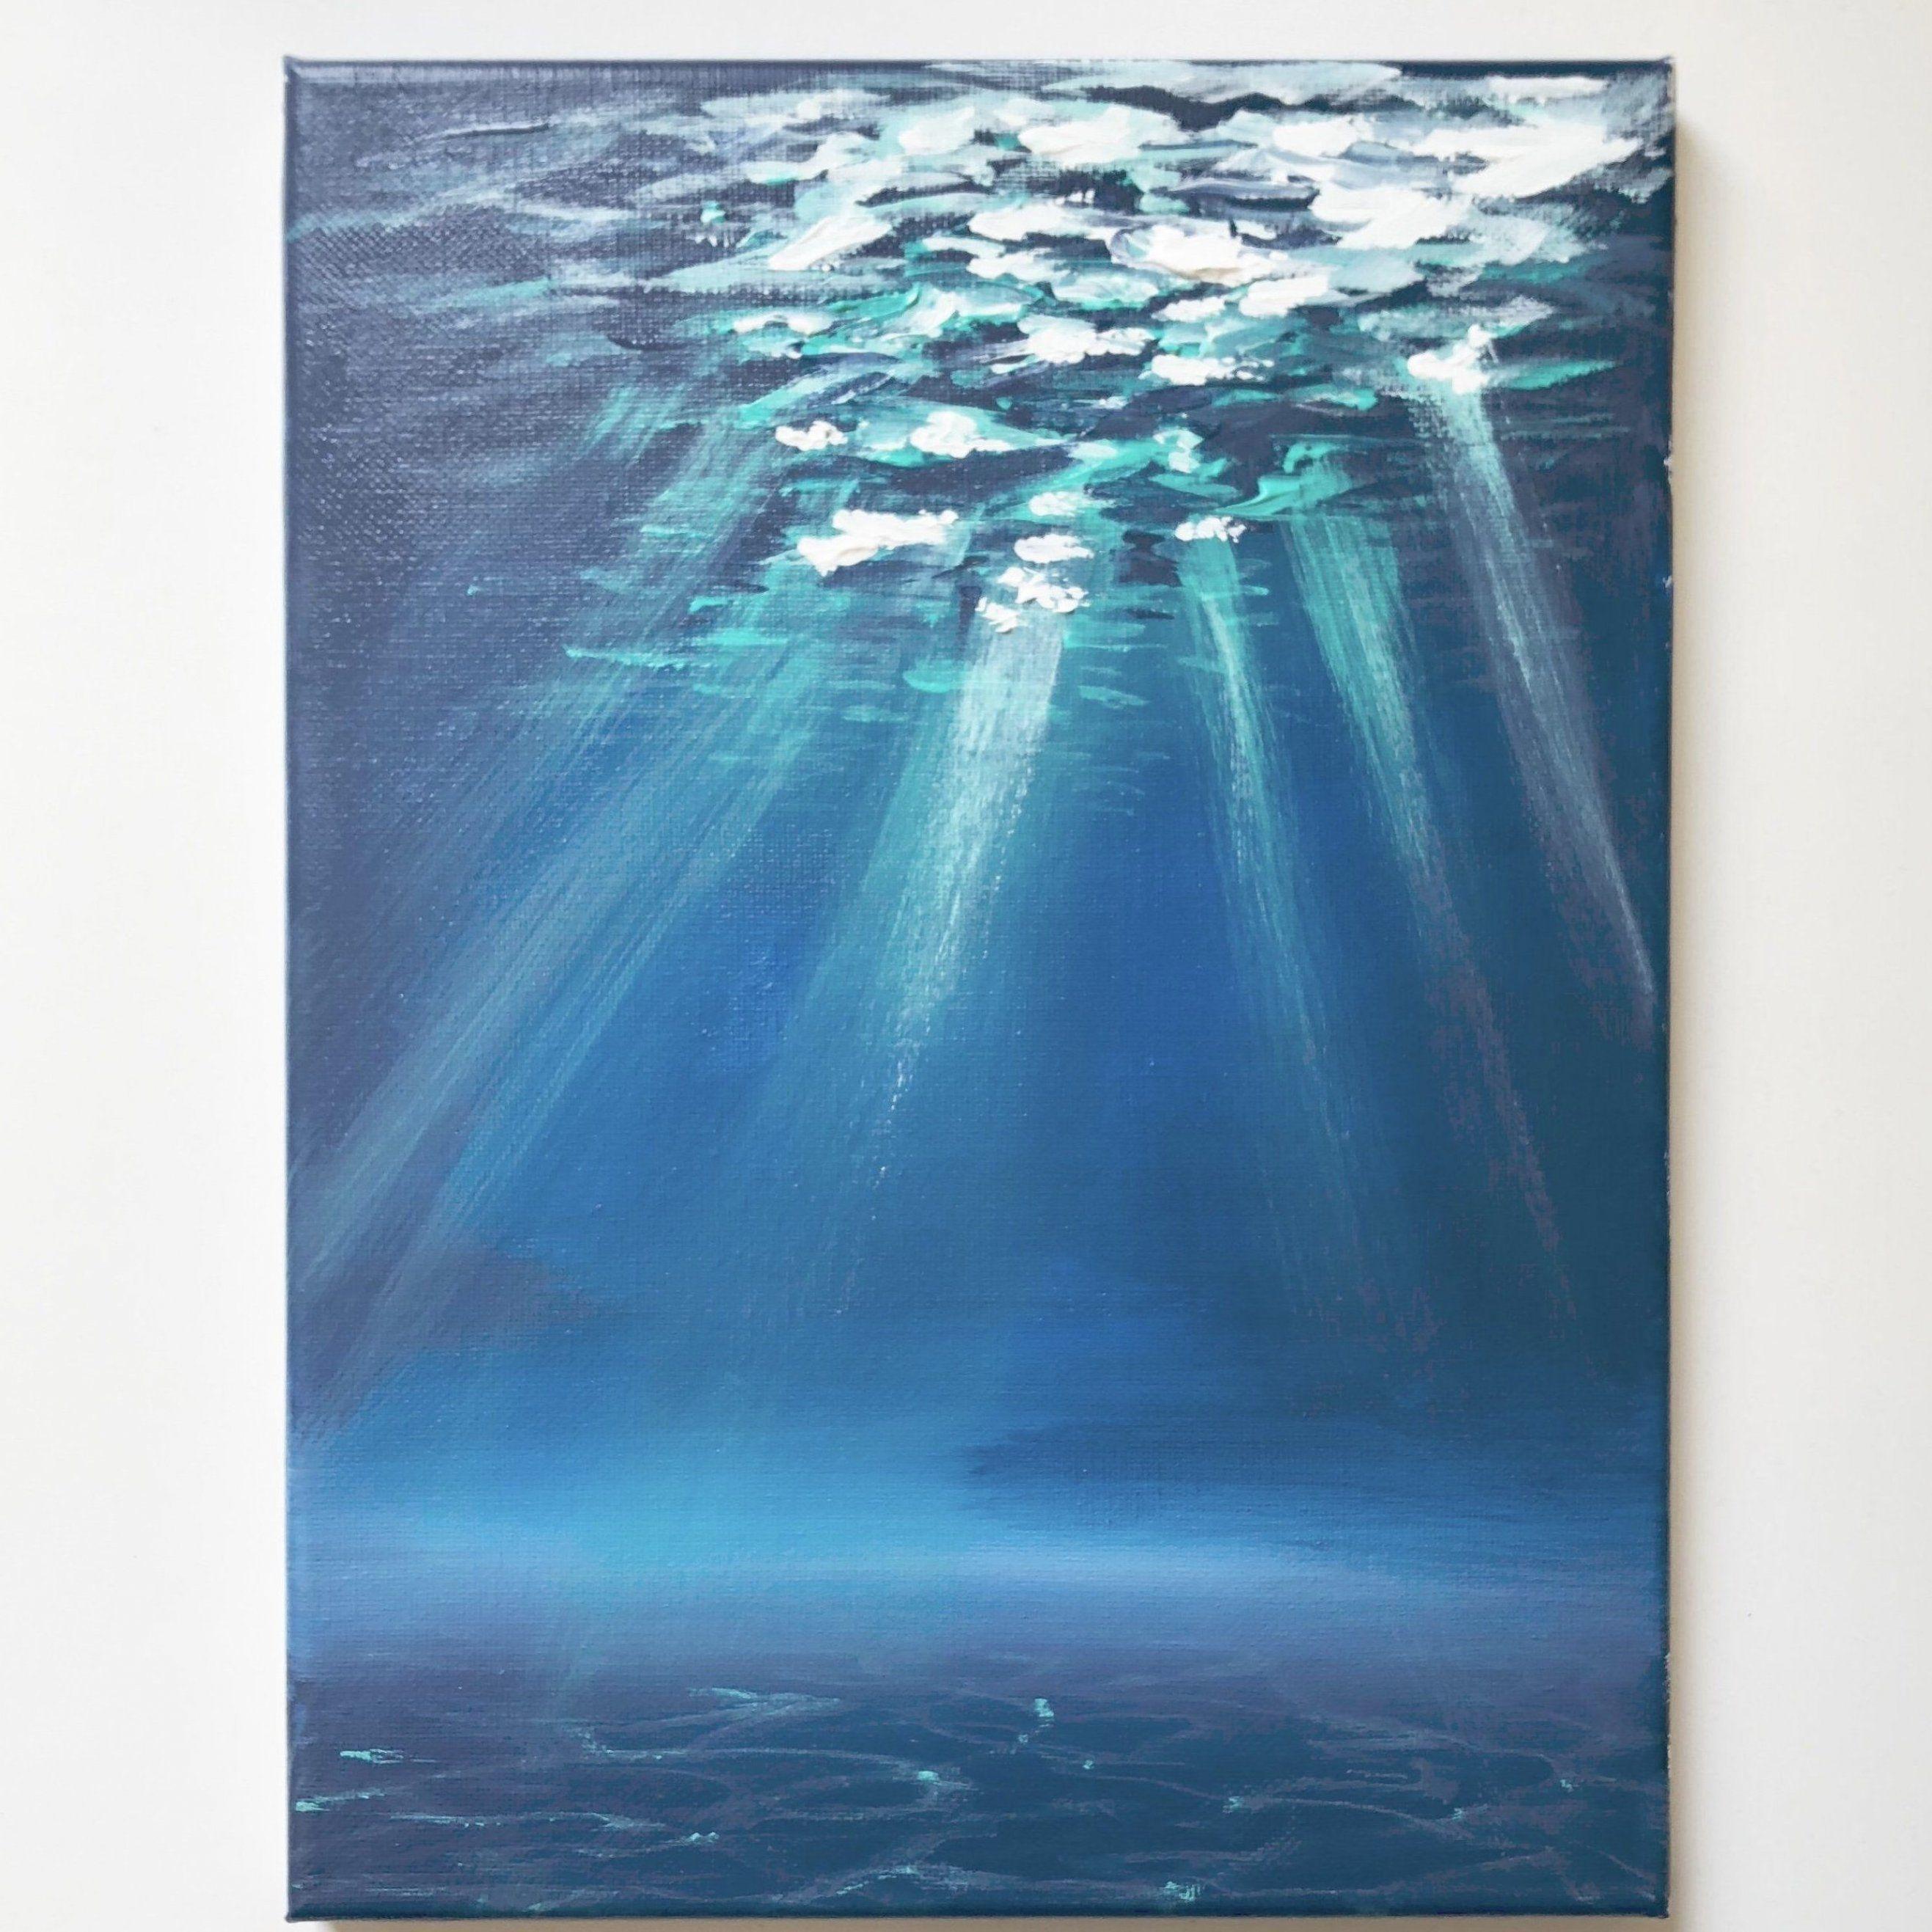 Painting Ideas On Canvas Painting Ideas On Canvas Painting Ideas On Canvas Painting Ide Trippy Painting Abstract Canvas Painting Beach Canvas Paintings